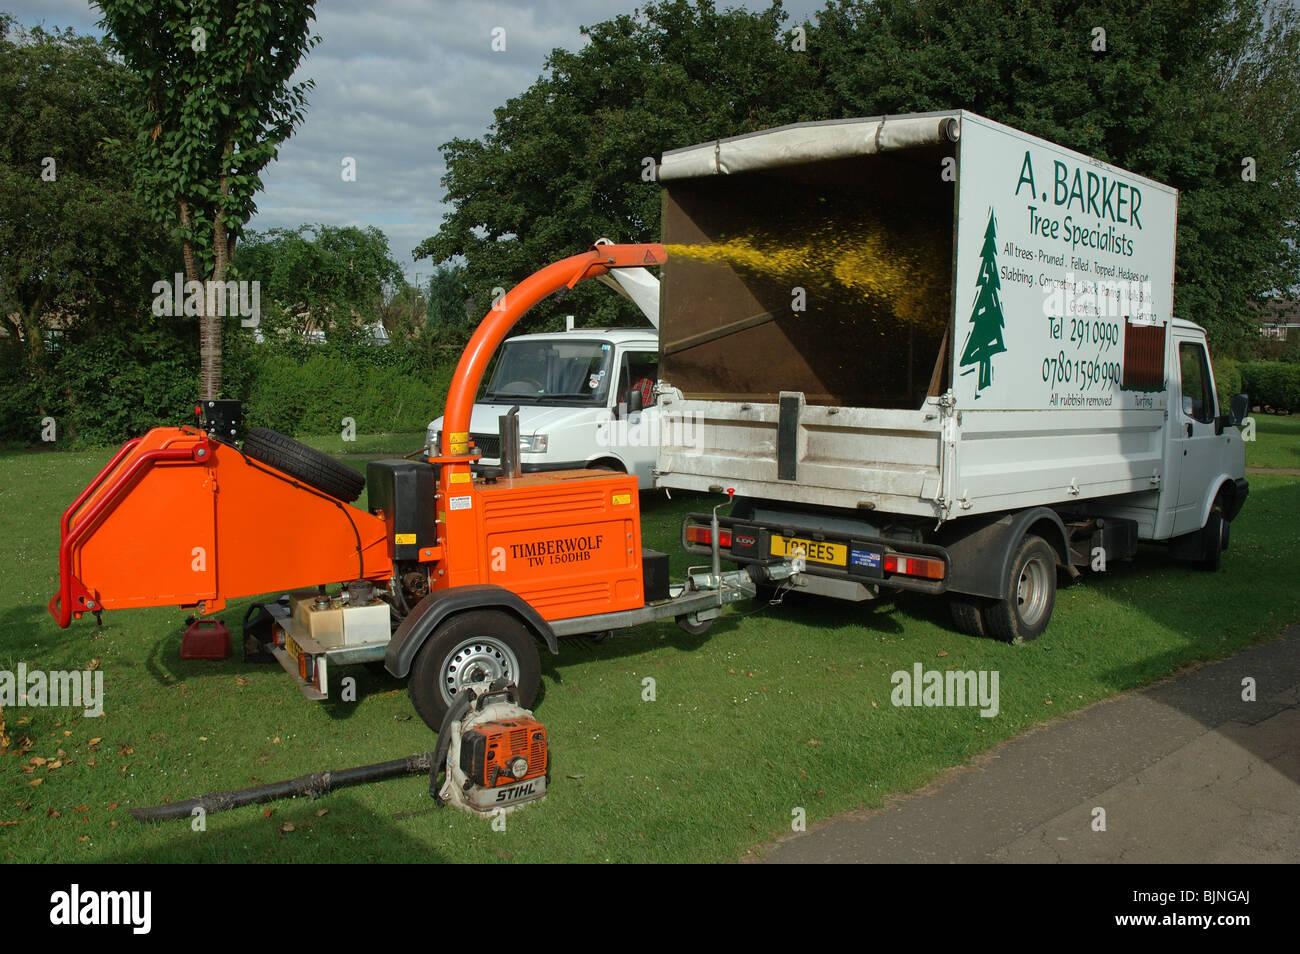 tree shredding machine